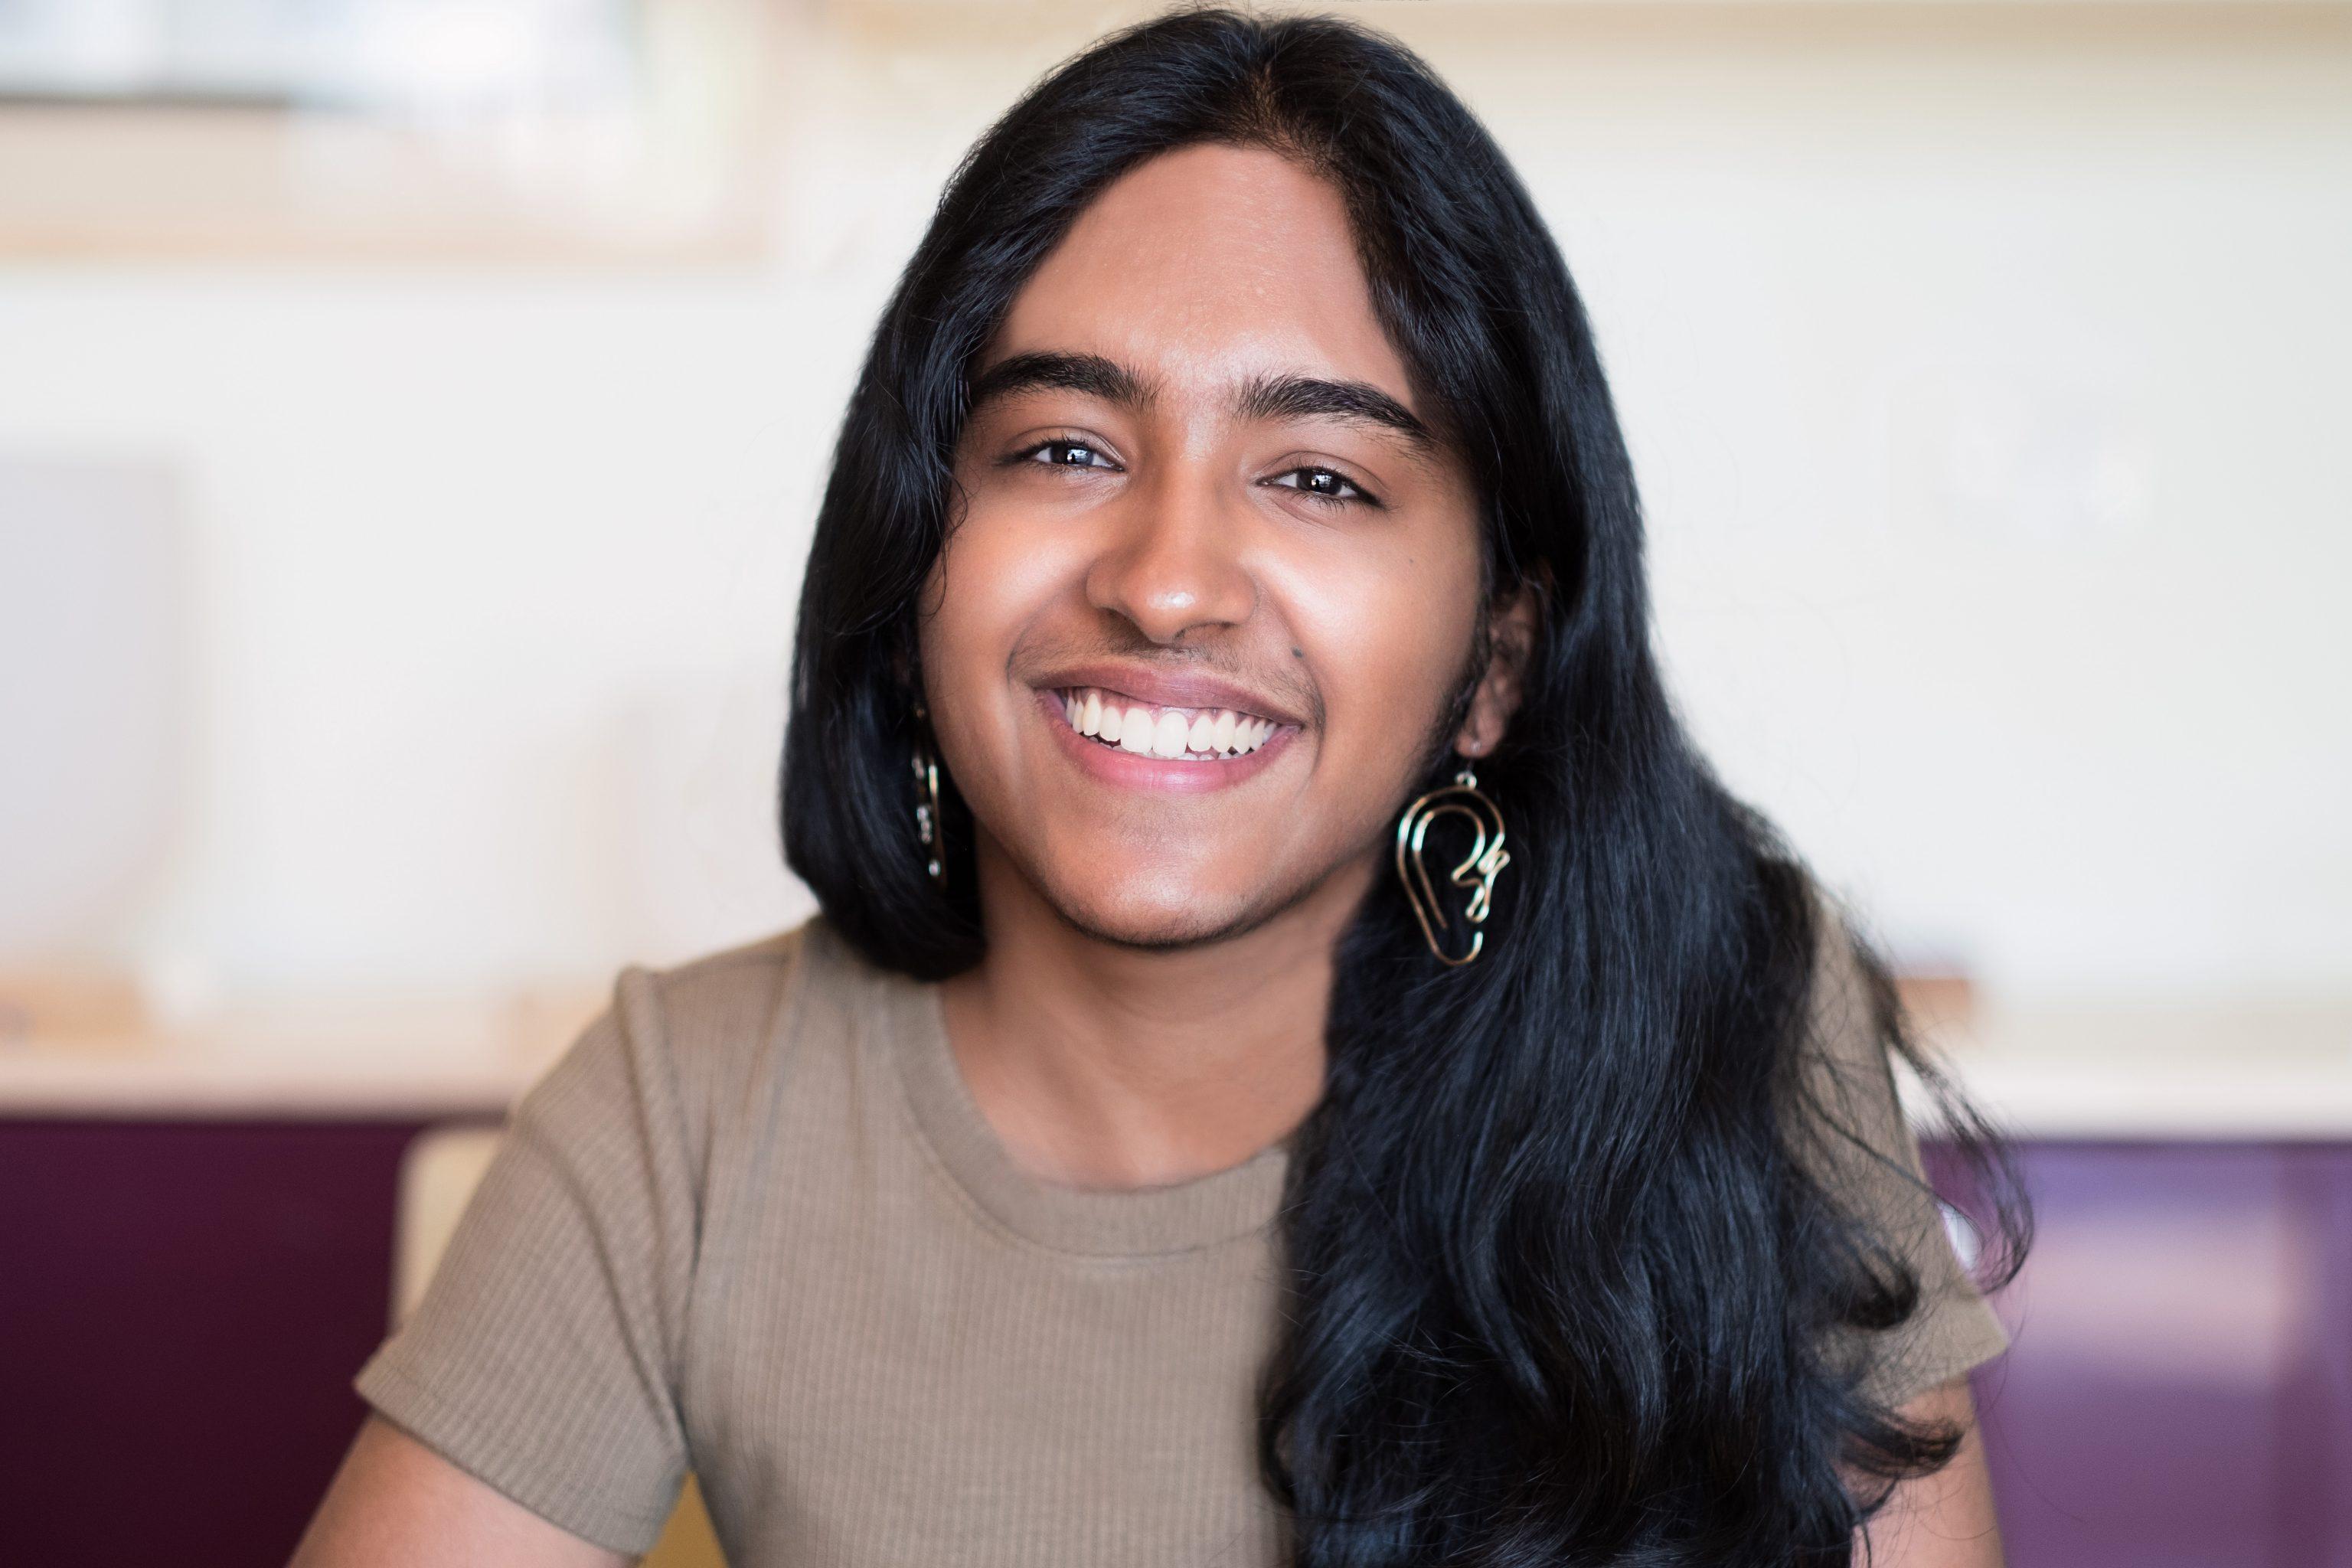 Keerthana Velappan, Au.D. : Doctor of Audiology